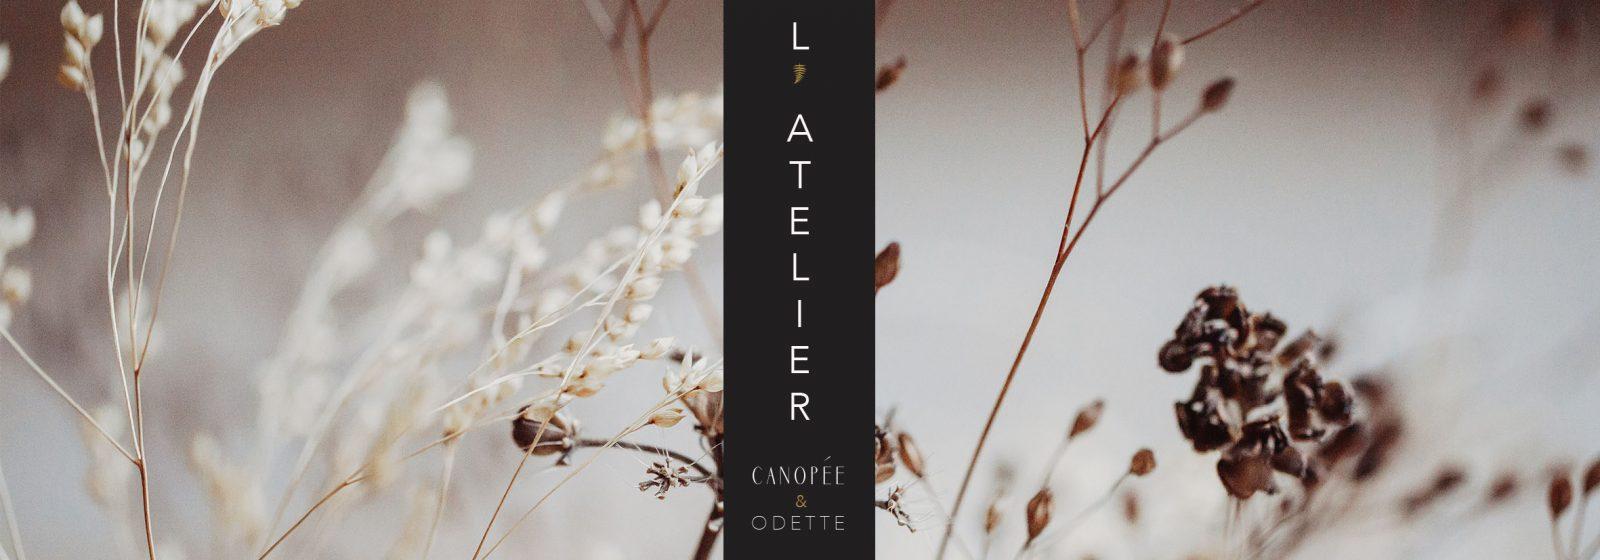 Artisan L'Atelier Canopée et Odette – Lavaur – Tarn